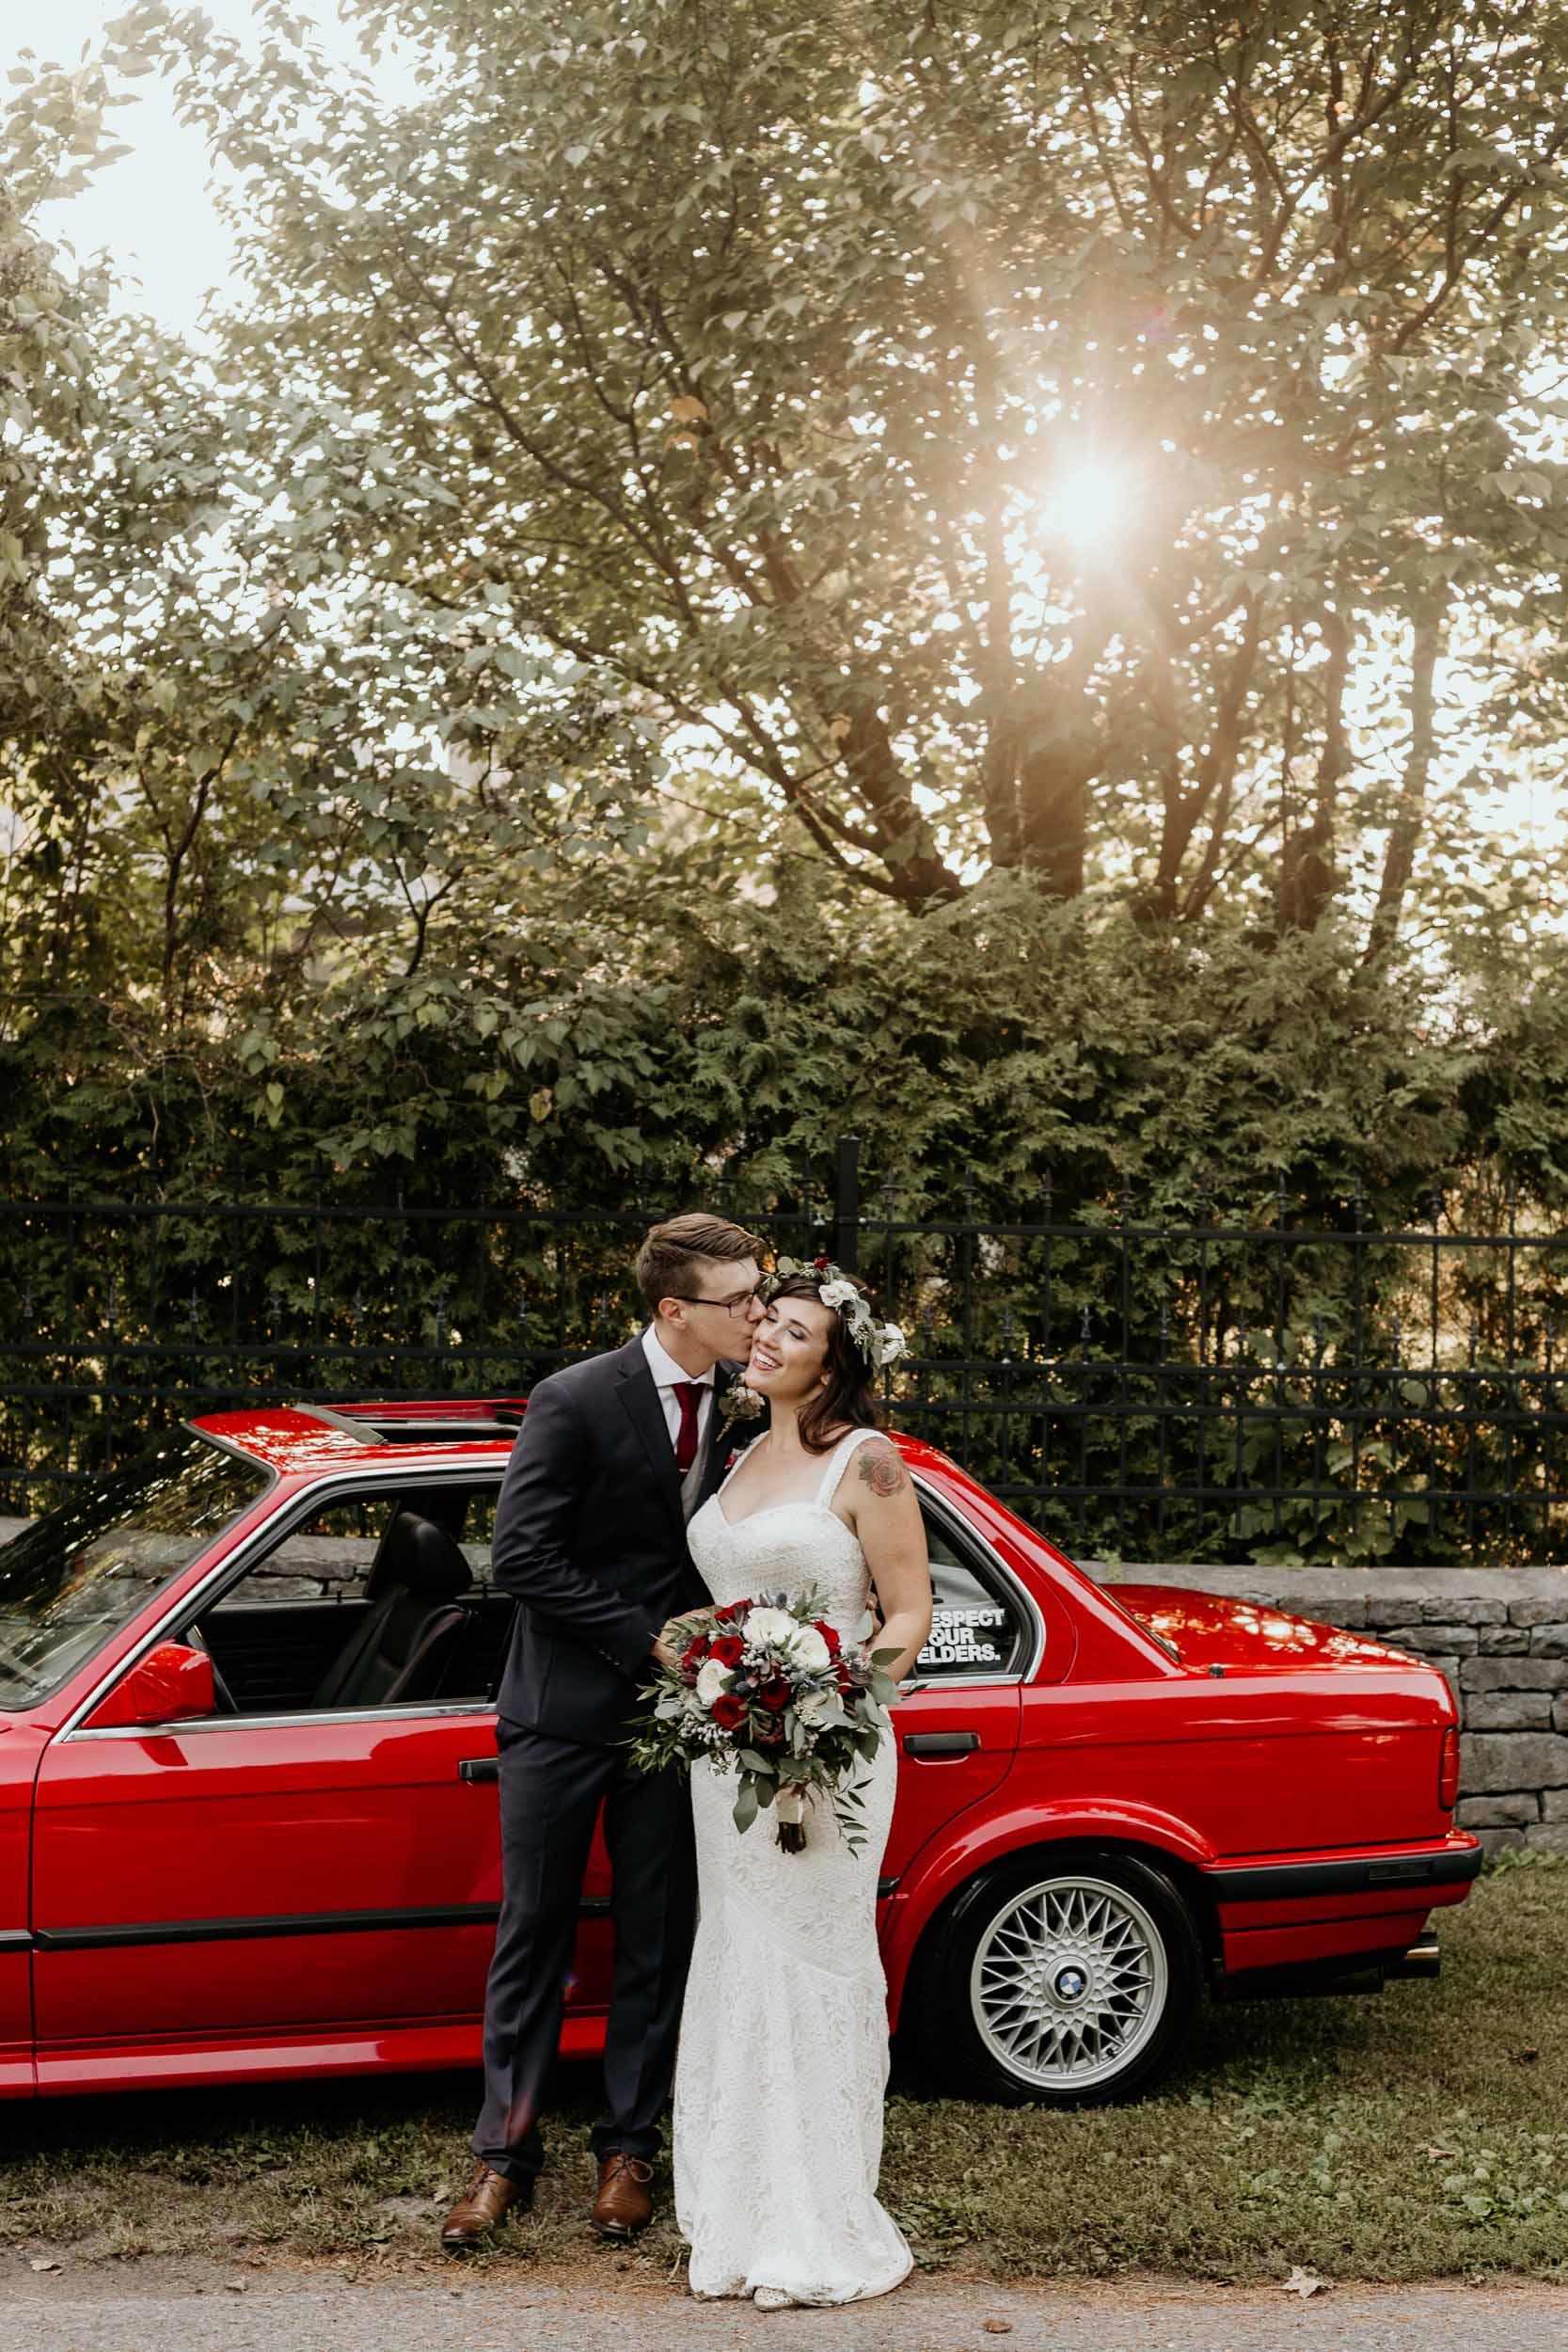 intimate-wedding-elopement-photographer-ottawa-toronto-8141.jpg